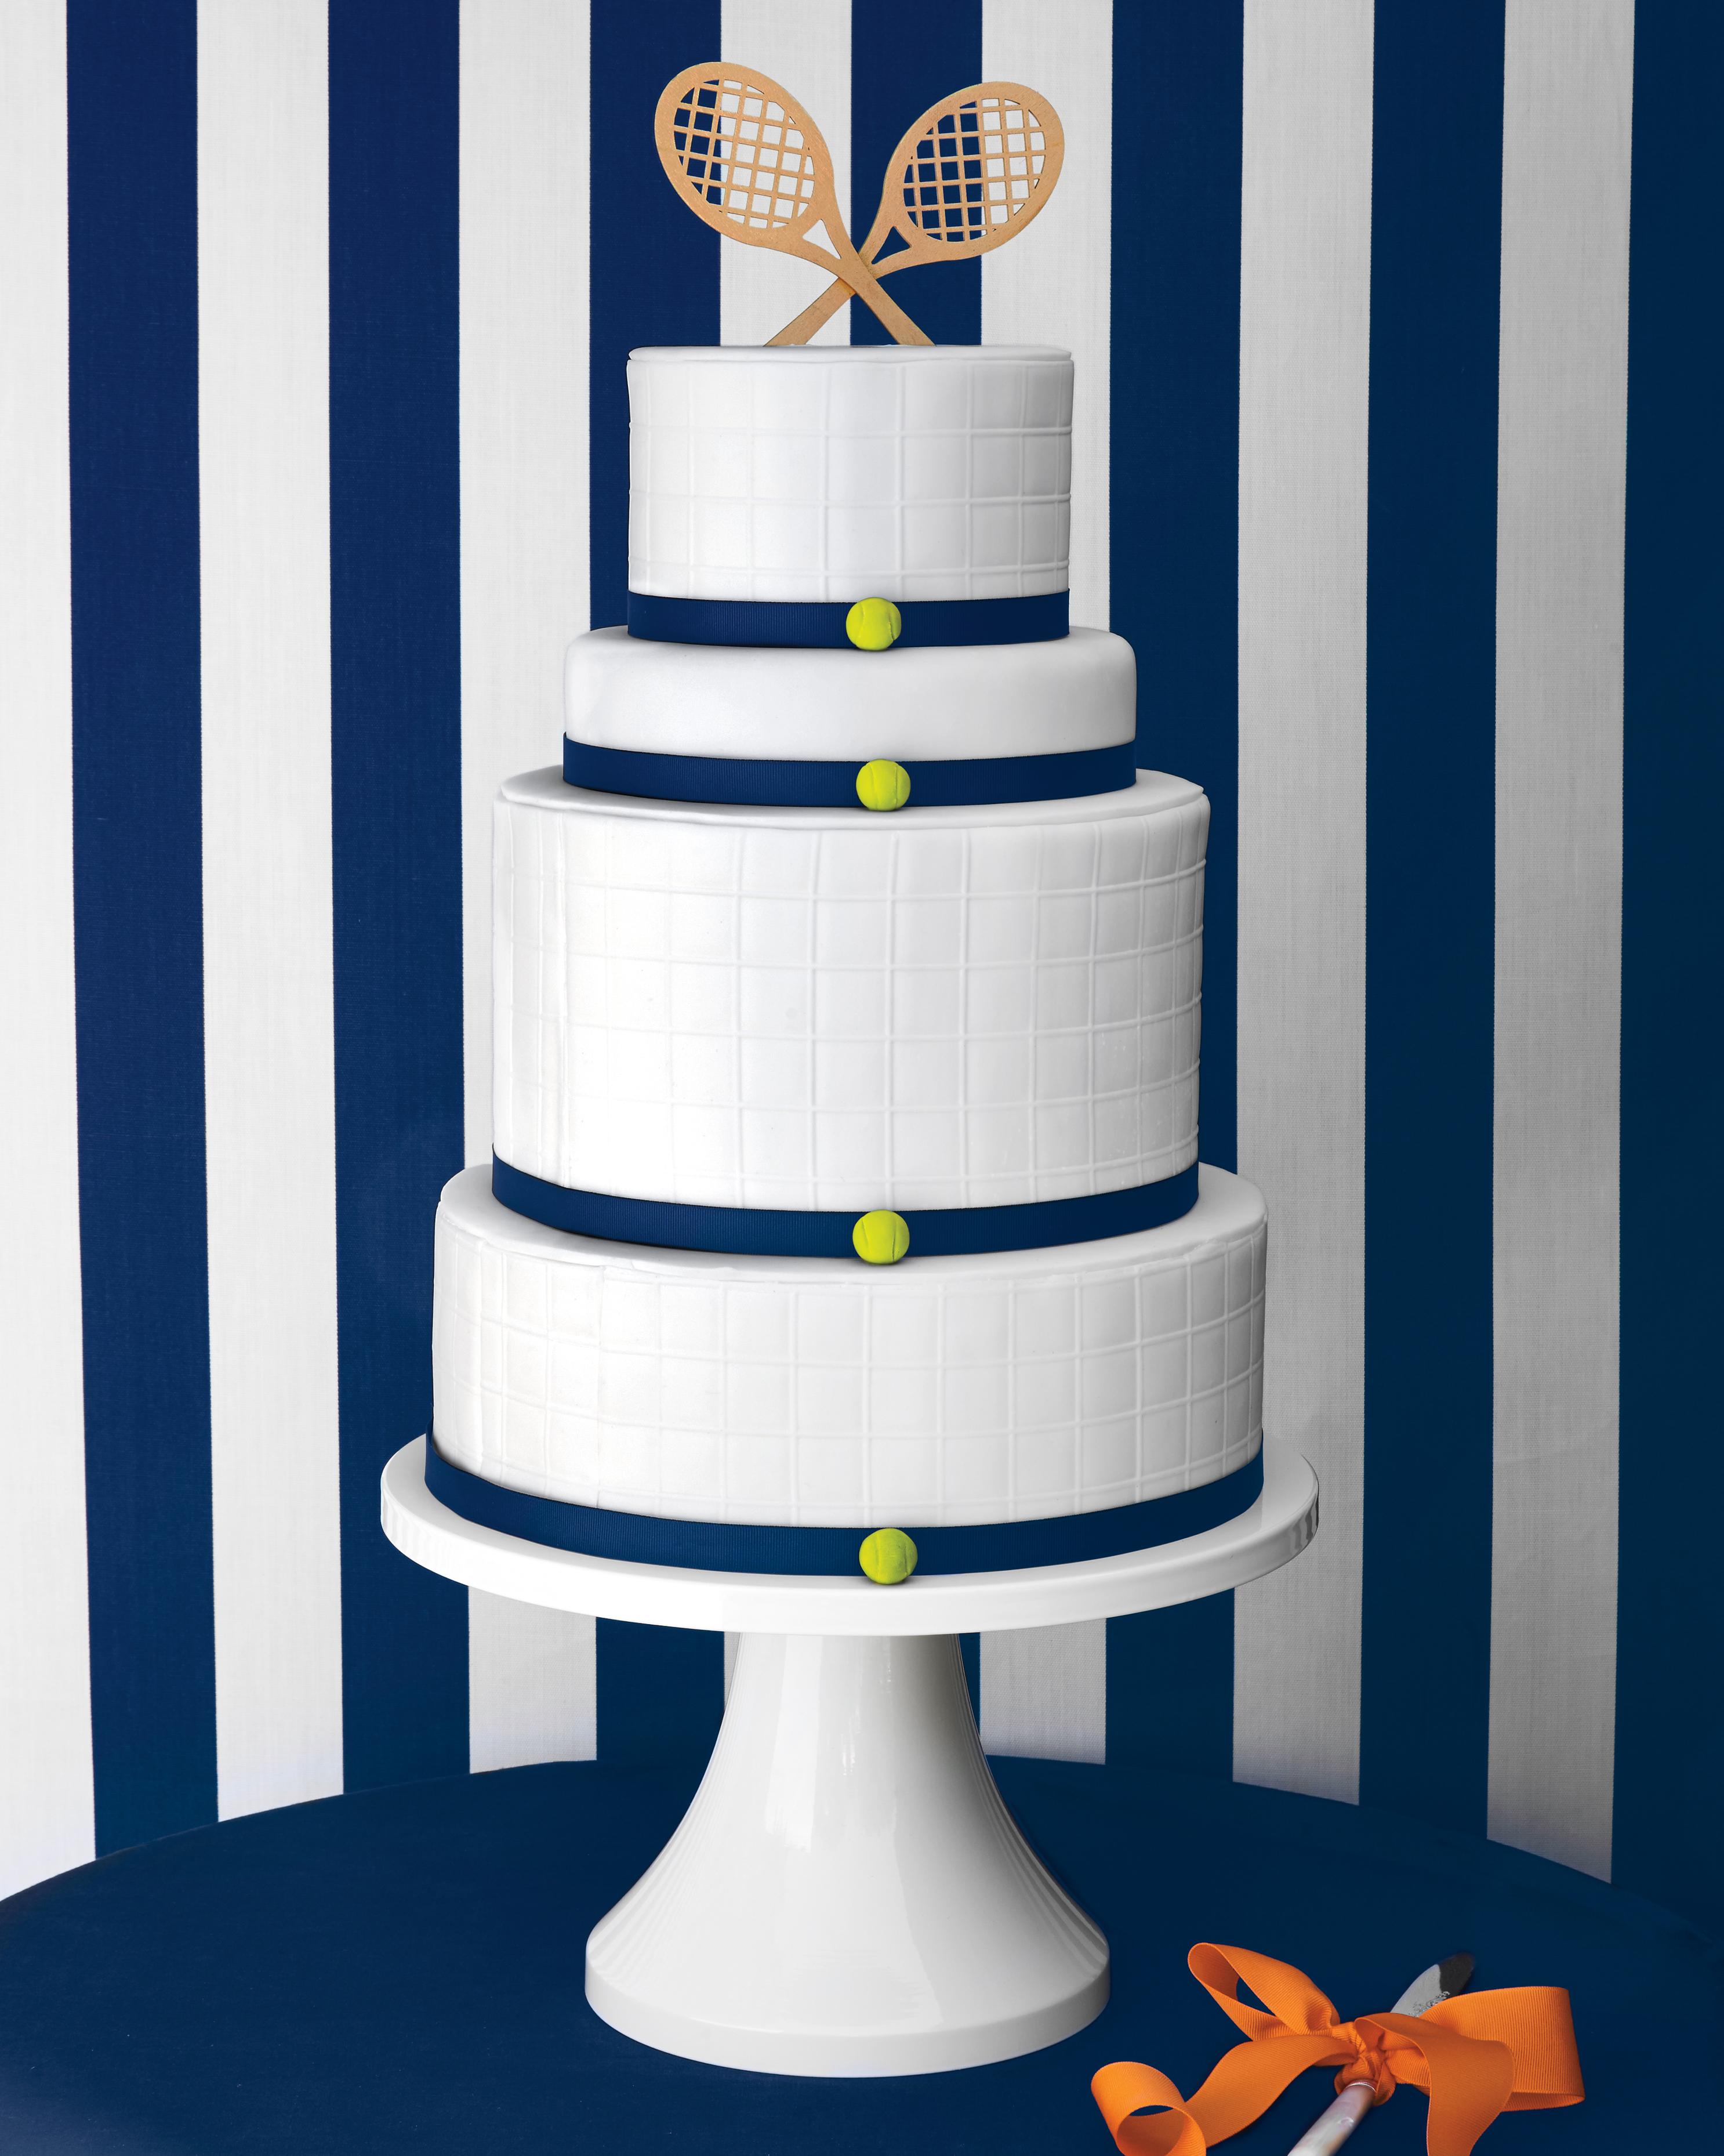 wedding-cake-tennis-raquets-msw-05-23-13-cake-4540-md110142.jpg